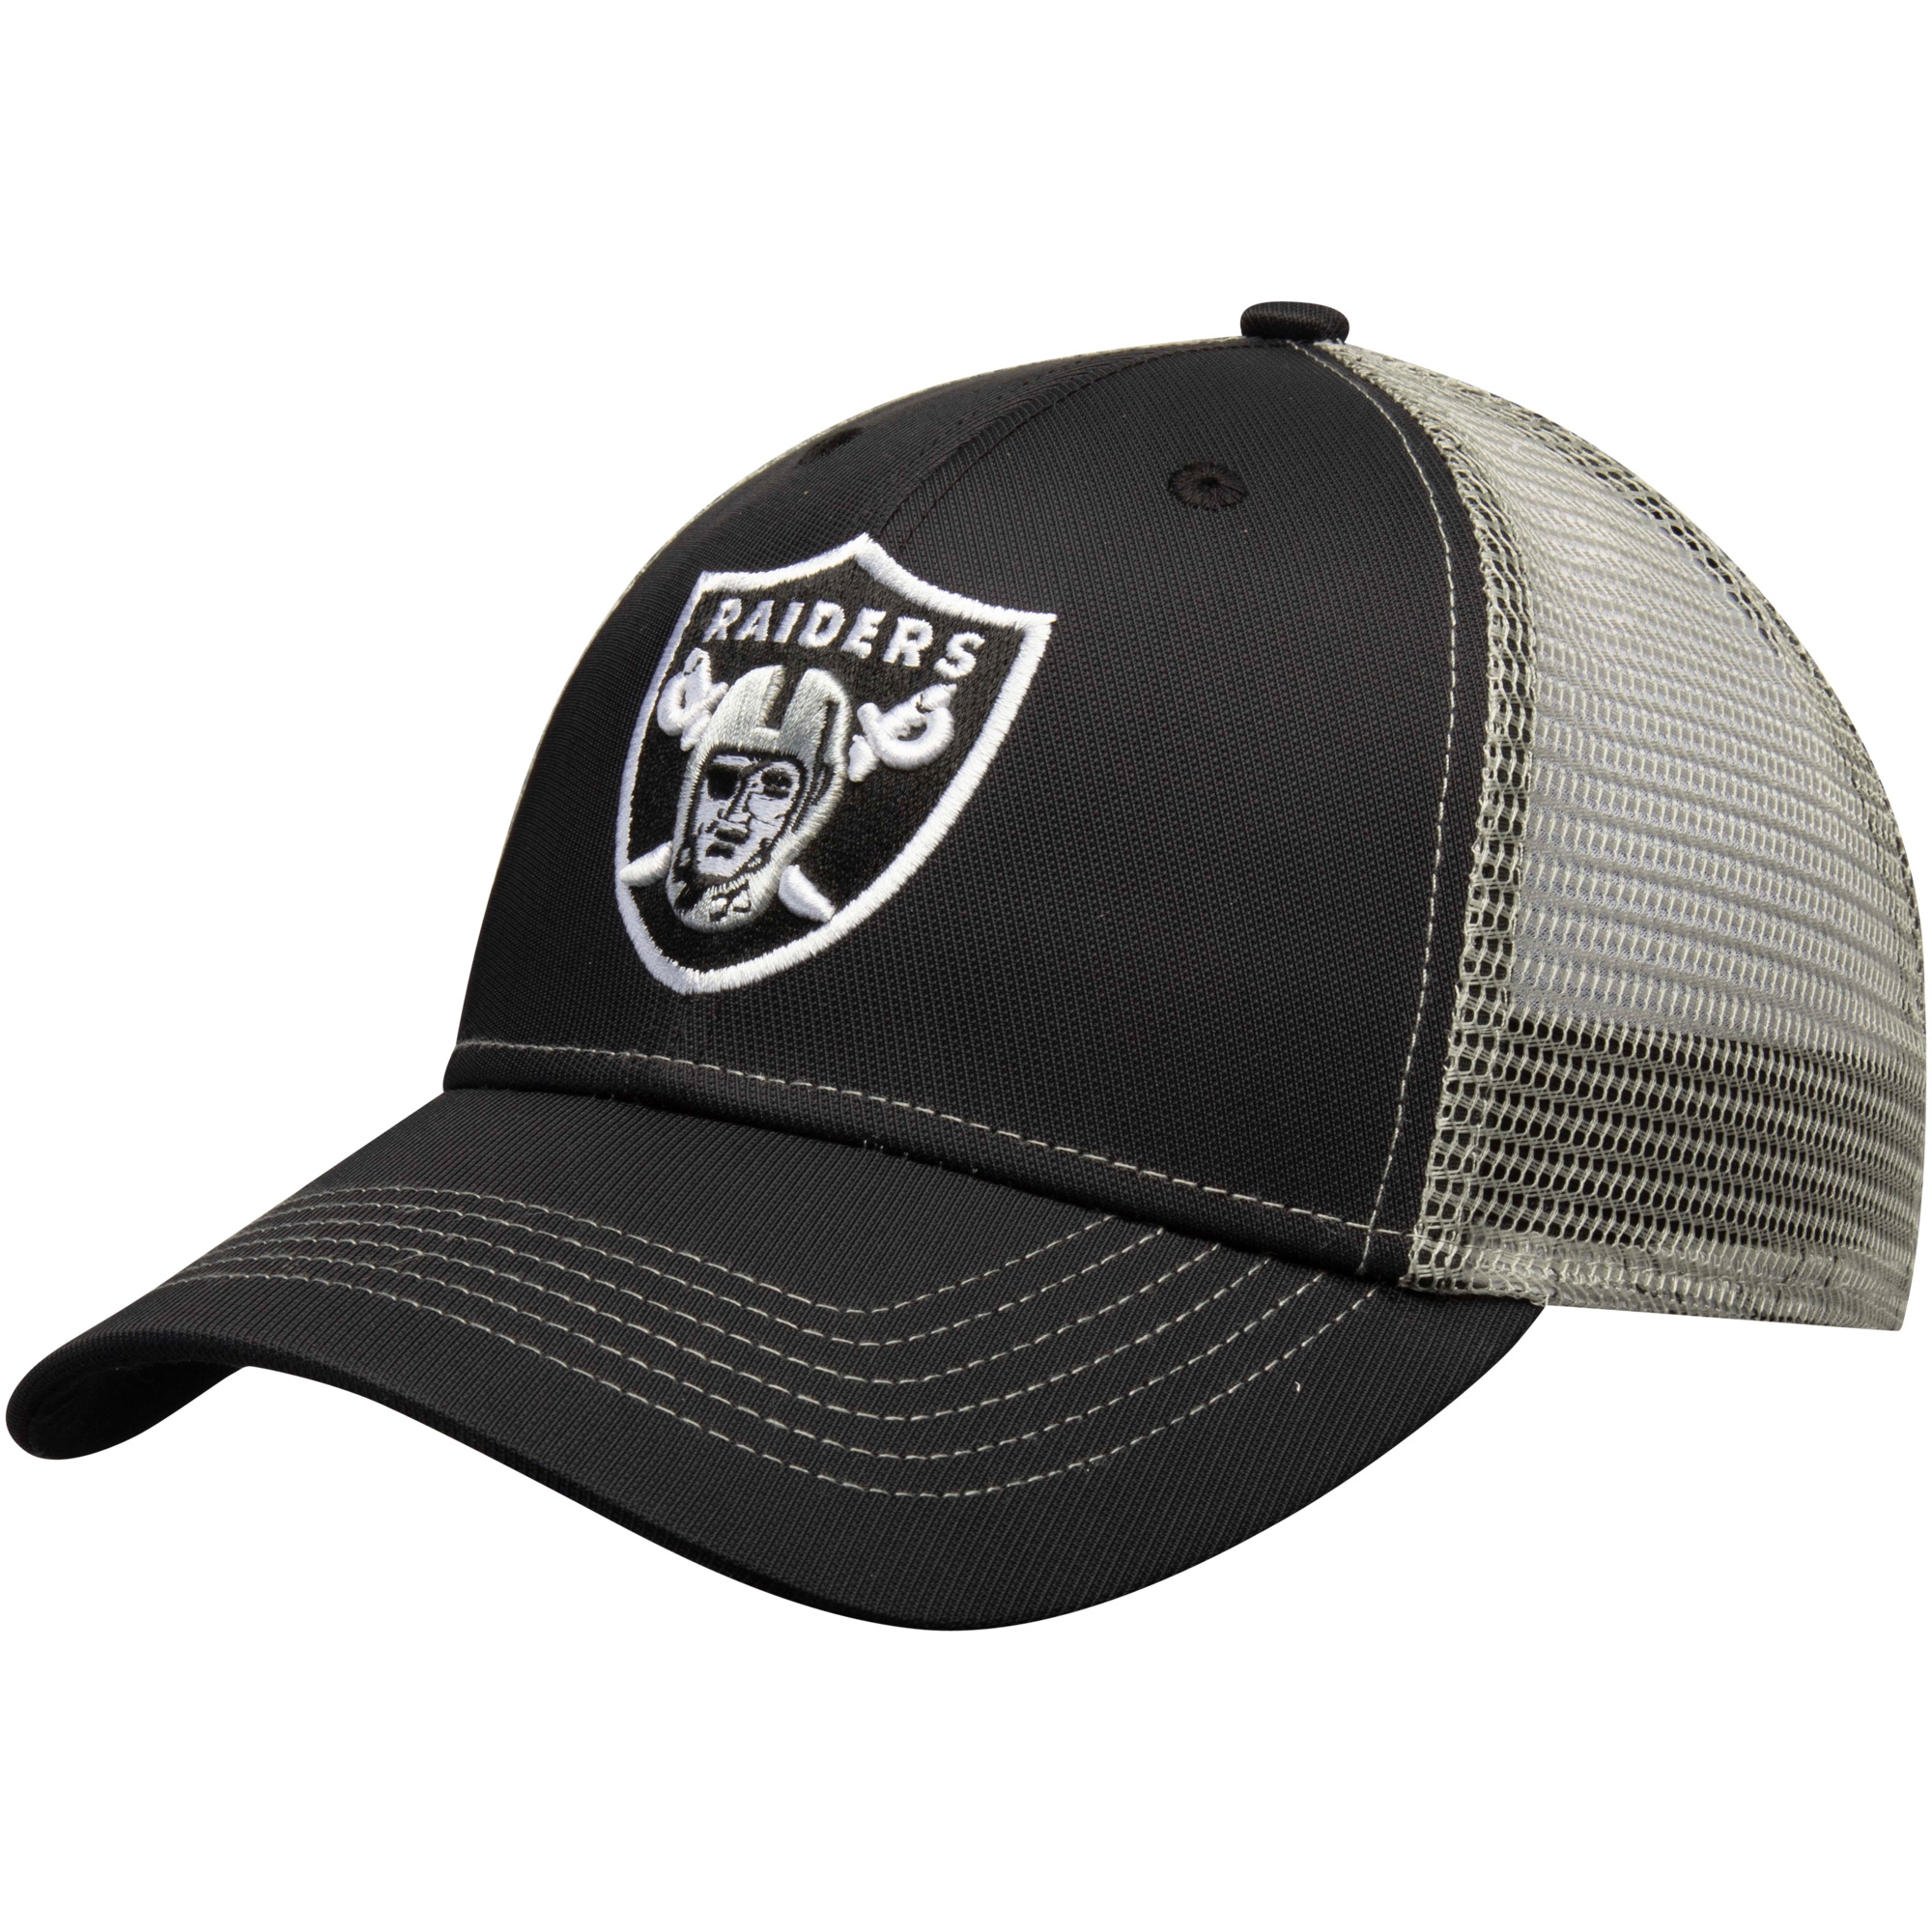 Men's Black Oakland Raiders Explore Adjustable Hat - OSFA